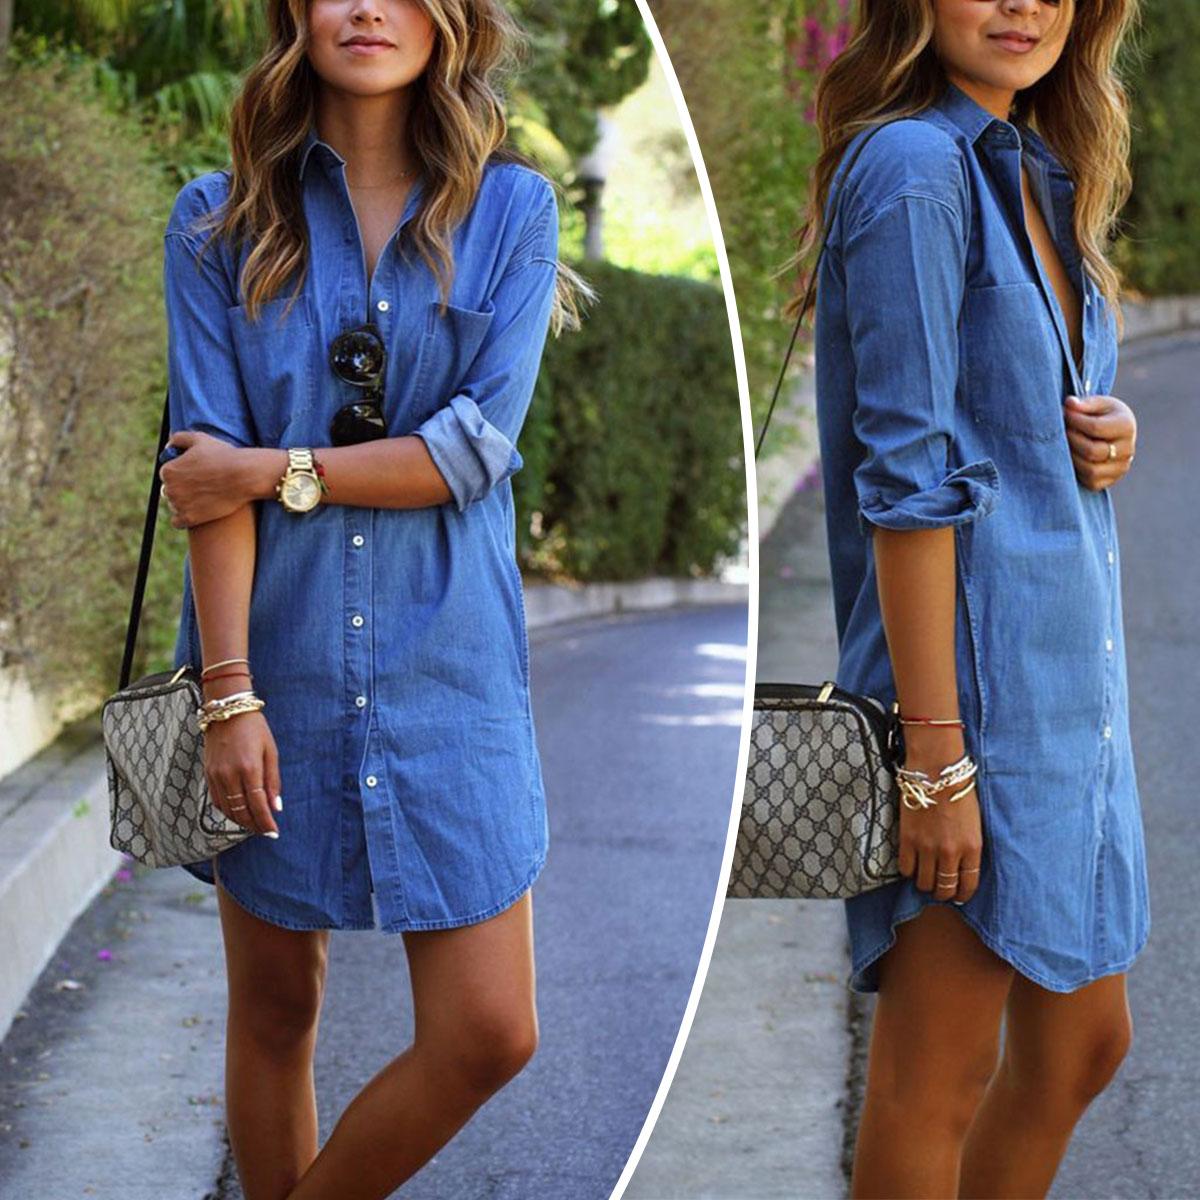 Details about US Summer Women Jeans Denim Shirt Dress Long Sleeve Causal  Mini Dress Plus Size